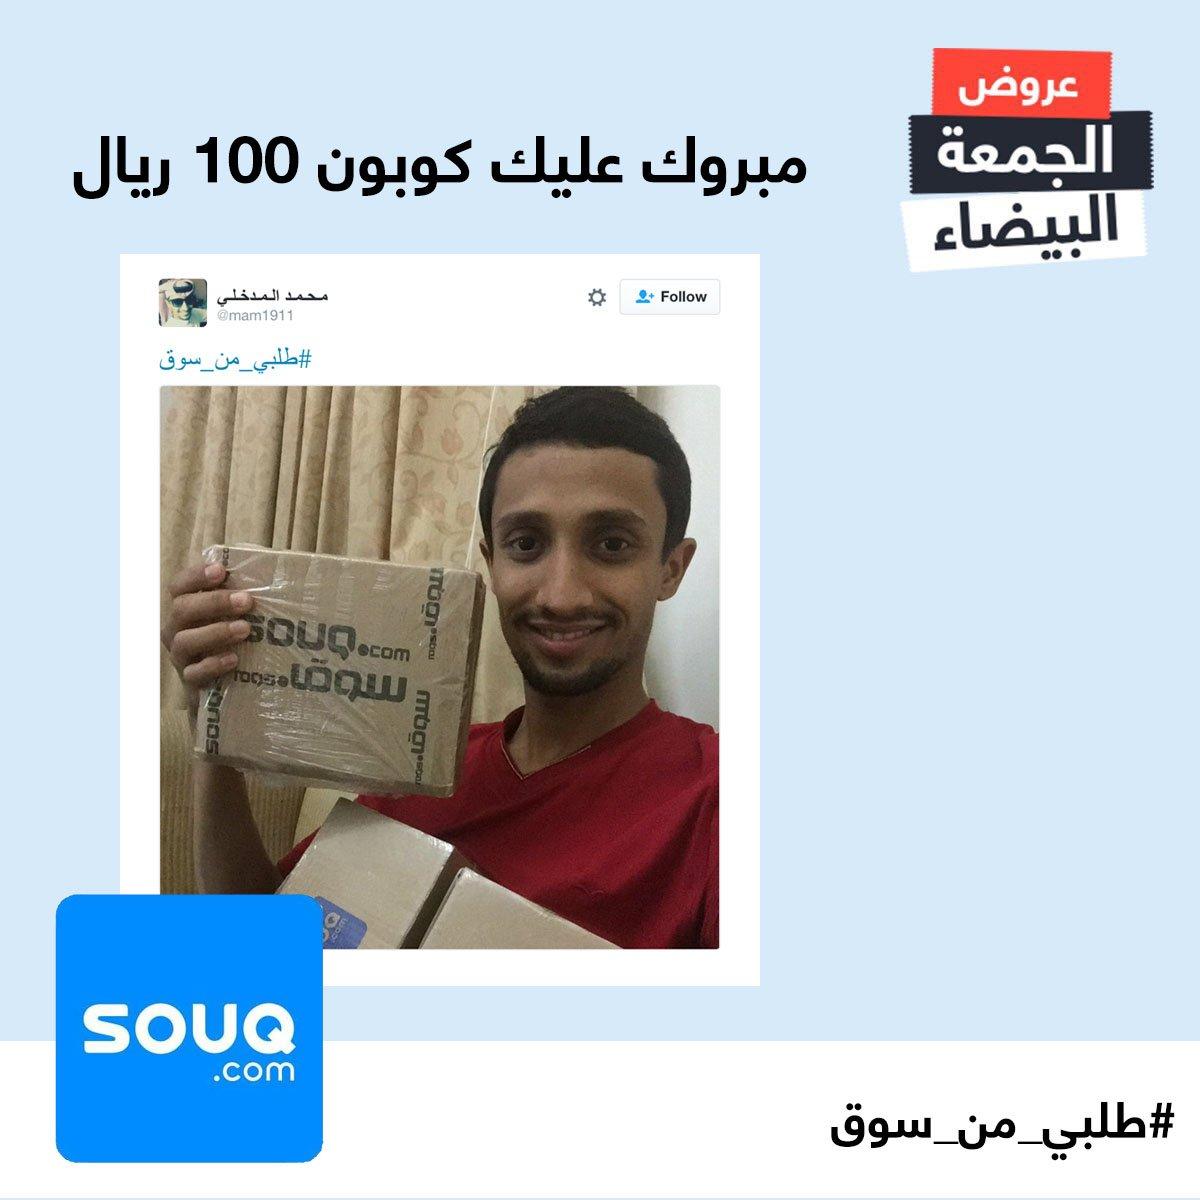 15ad9e8b7 Souq.com KSA on Twitter: